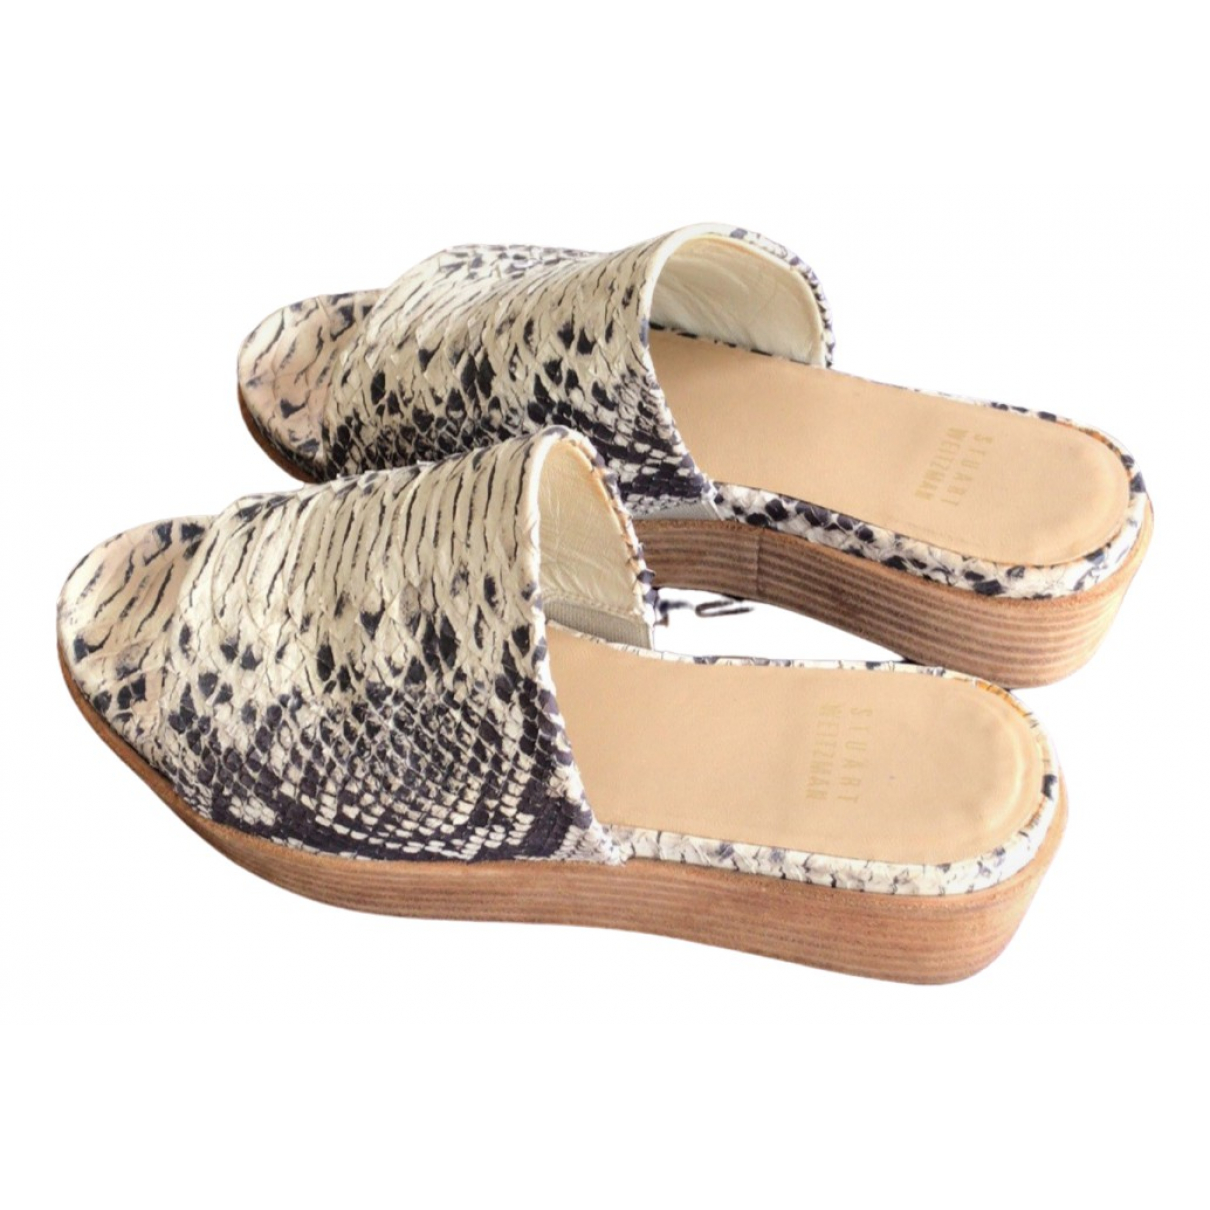 Stuart Weitzman \N Leather Sandals for Women 36.5 EU